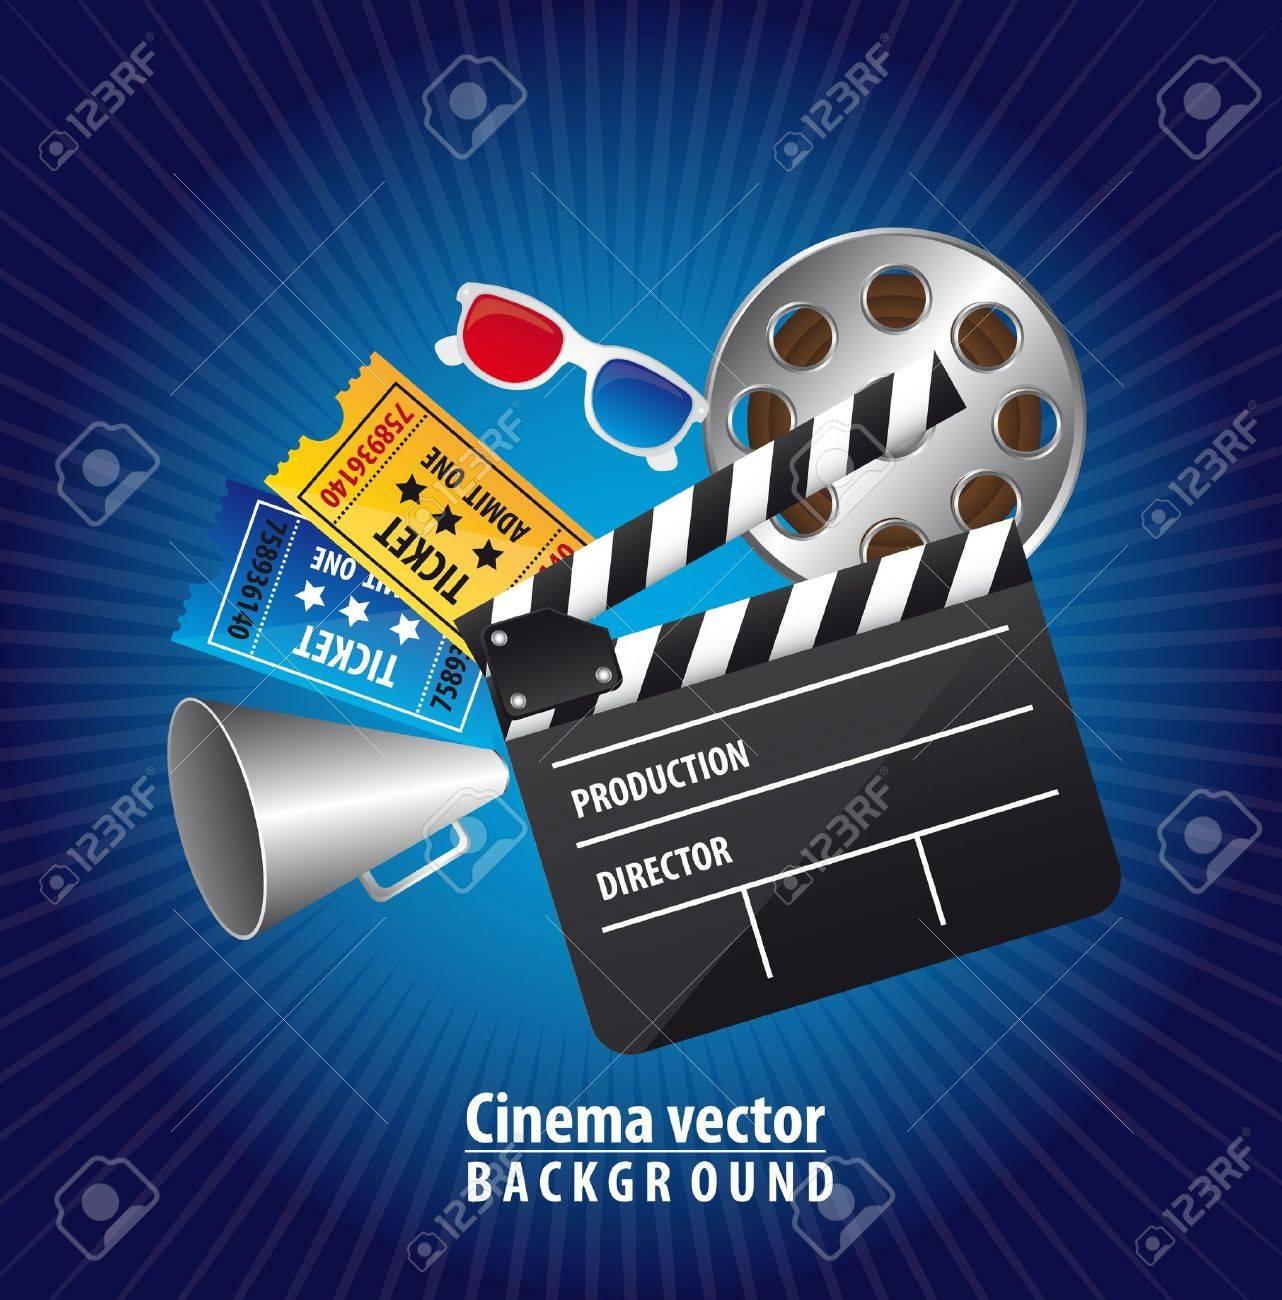 cinema elements over blue background. vector illustration Stock Vector - 13216387